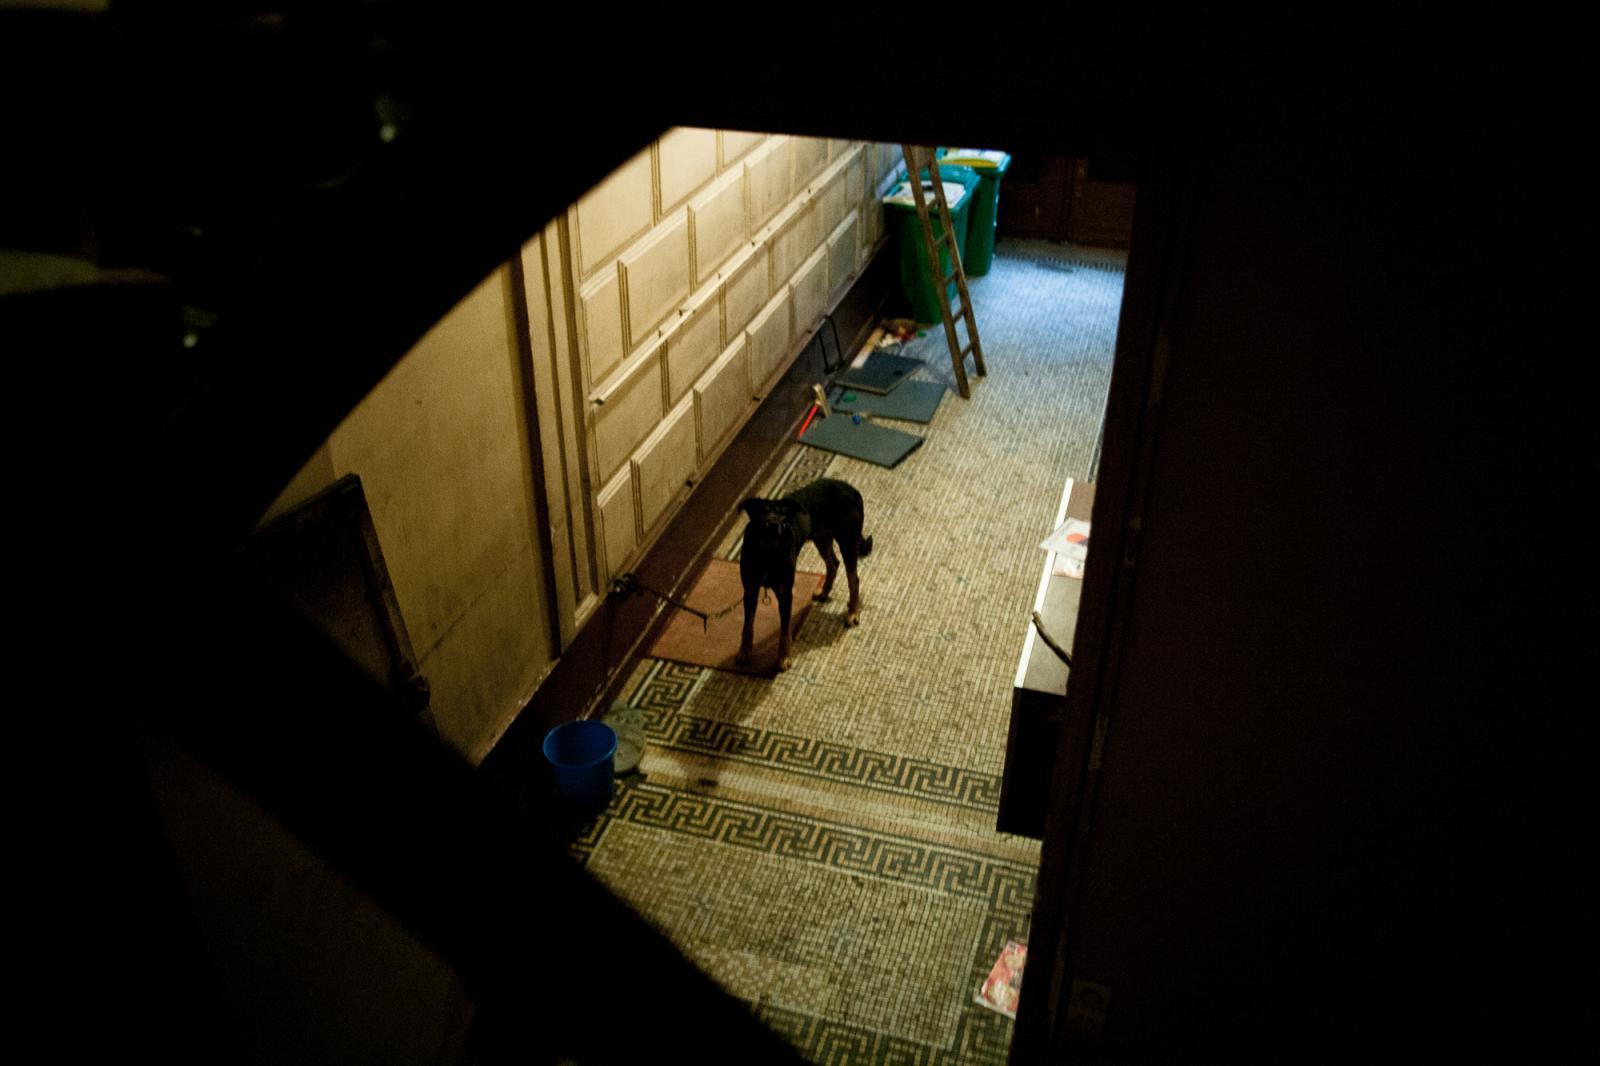 Photography image - Loading juj_roof_investigations_003.jpg